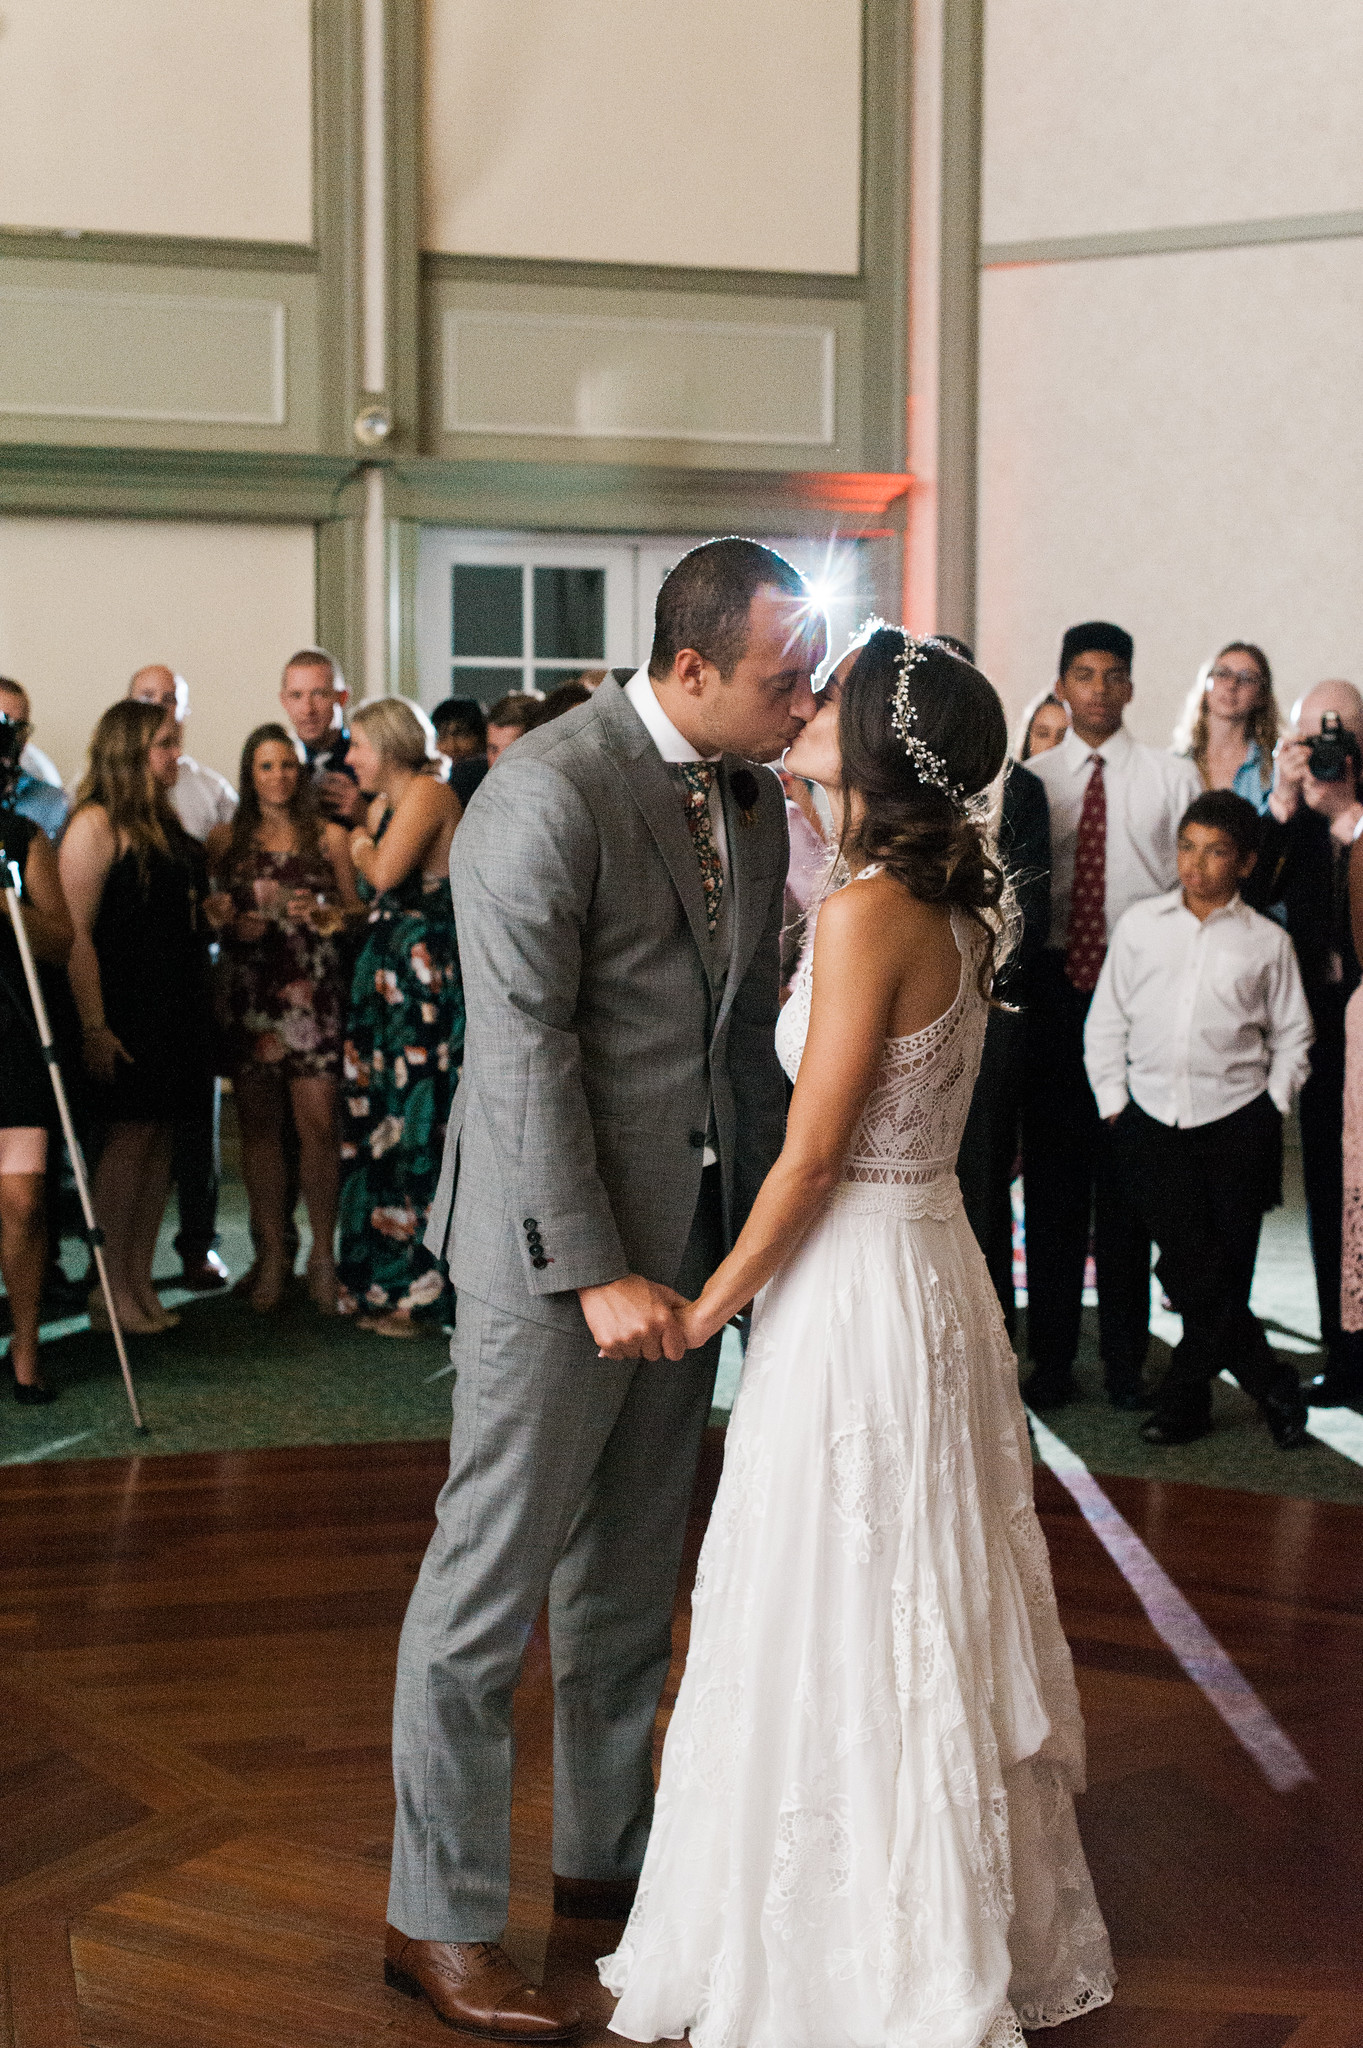 thomas-wedding-486-X4.jpg